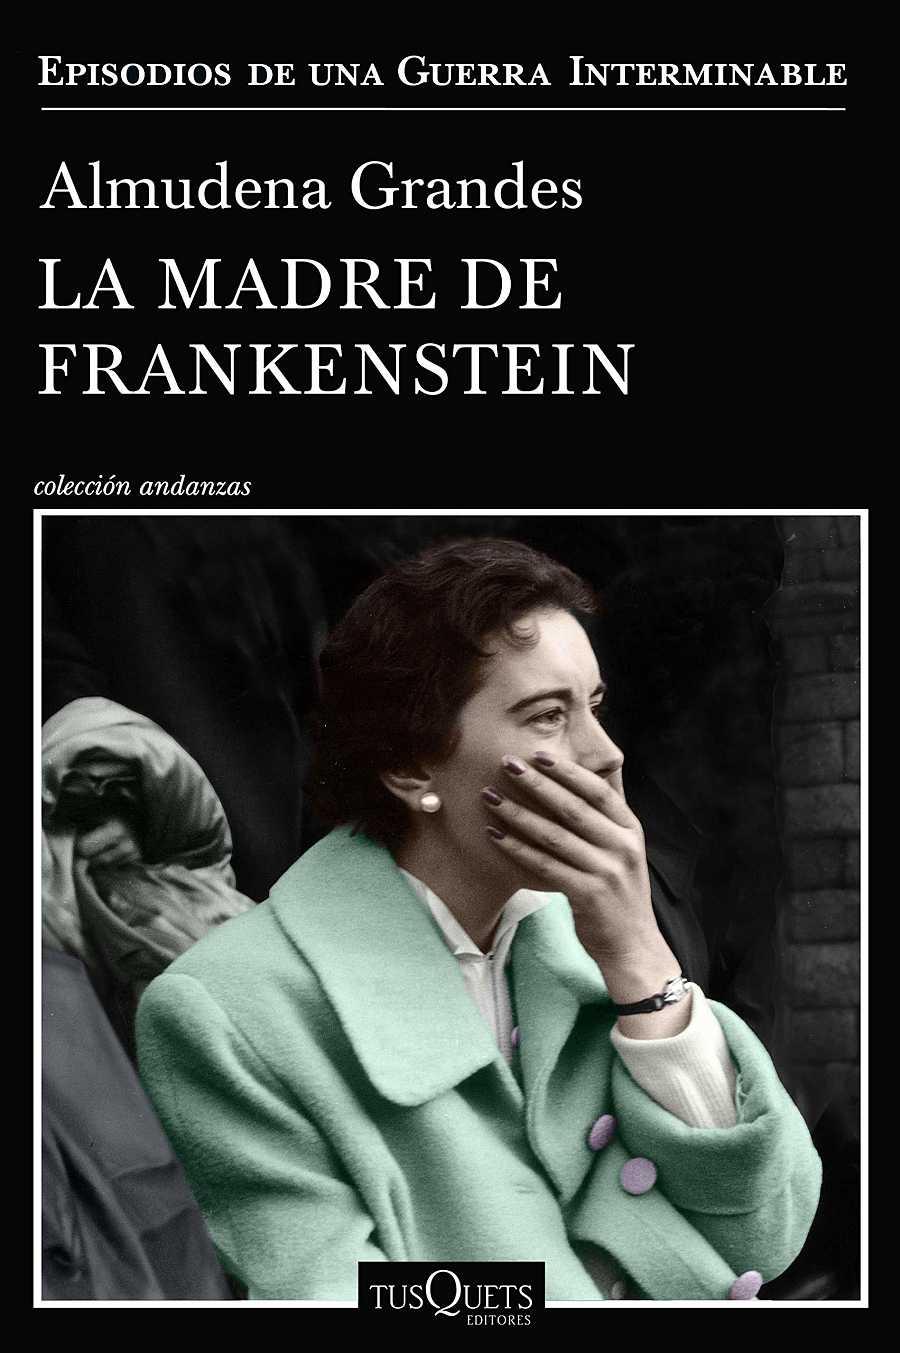 La madre de Frankenstein, una novela de Almudena Grandes